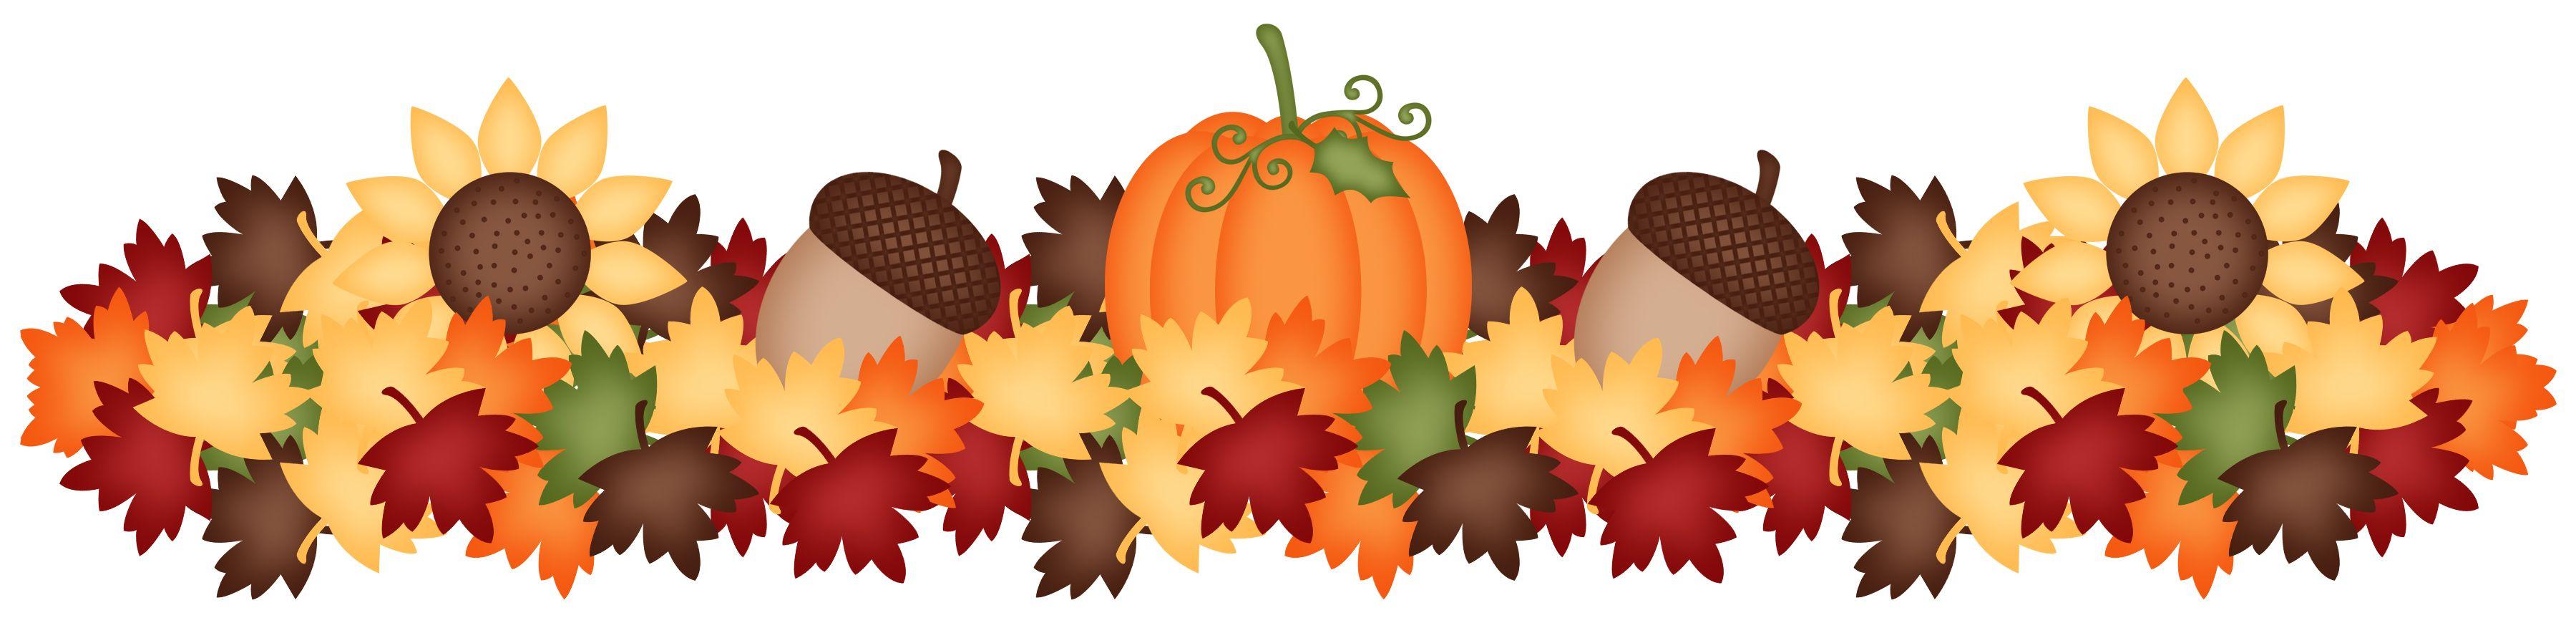 PUMPKIN AND ACORNS | Fall clip art, Fall borders, Fall crafts